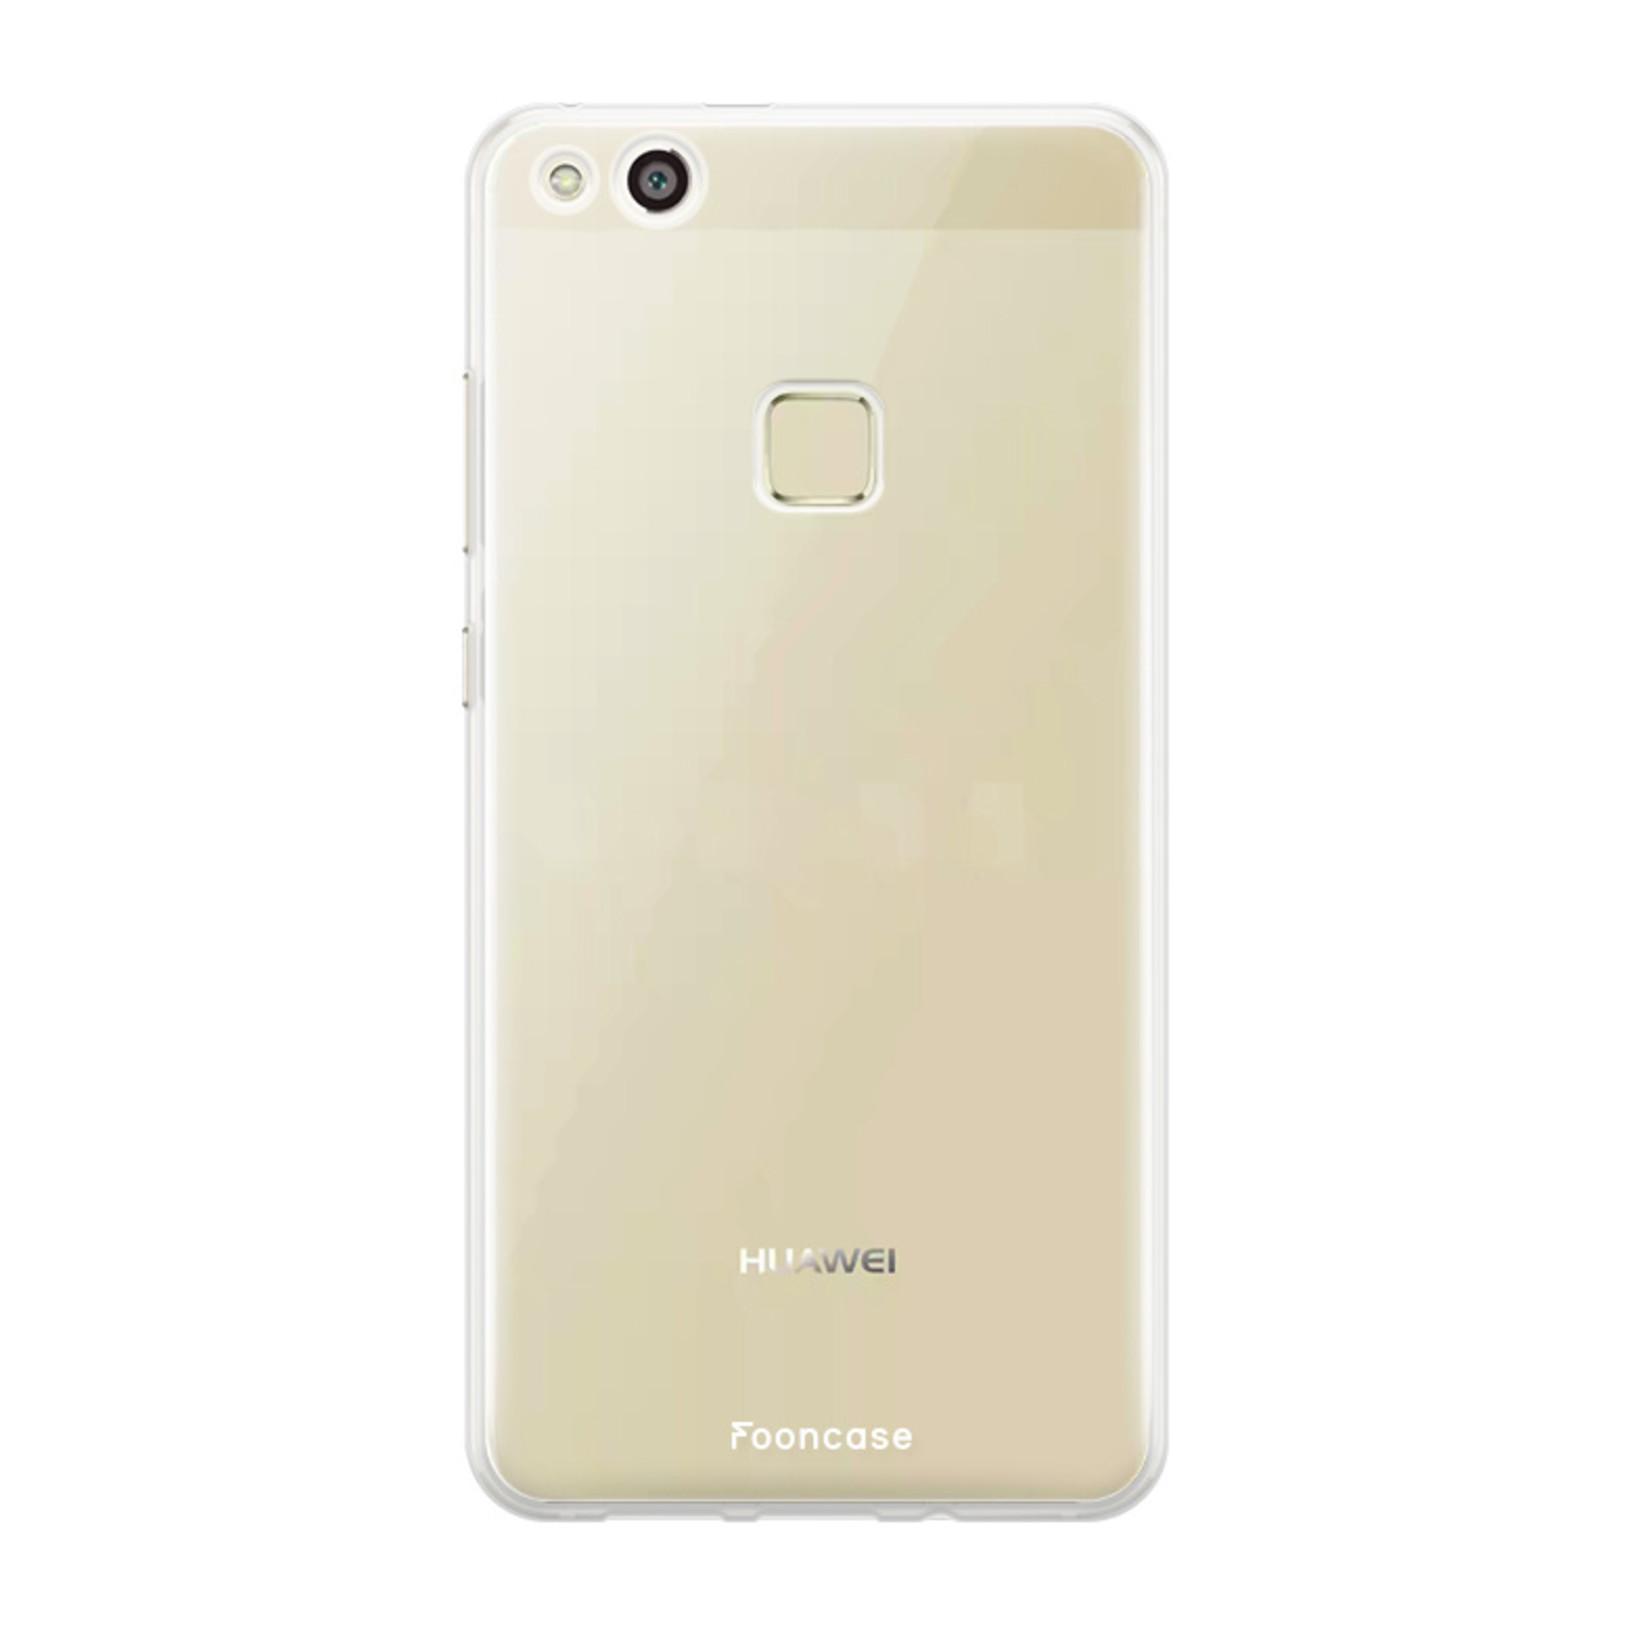 FOONCASE Huawei P10 Lite hoesje TPU Soft Case - Back Cover - Transparant / Doorzichtig